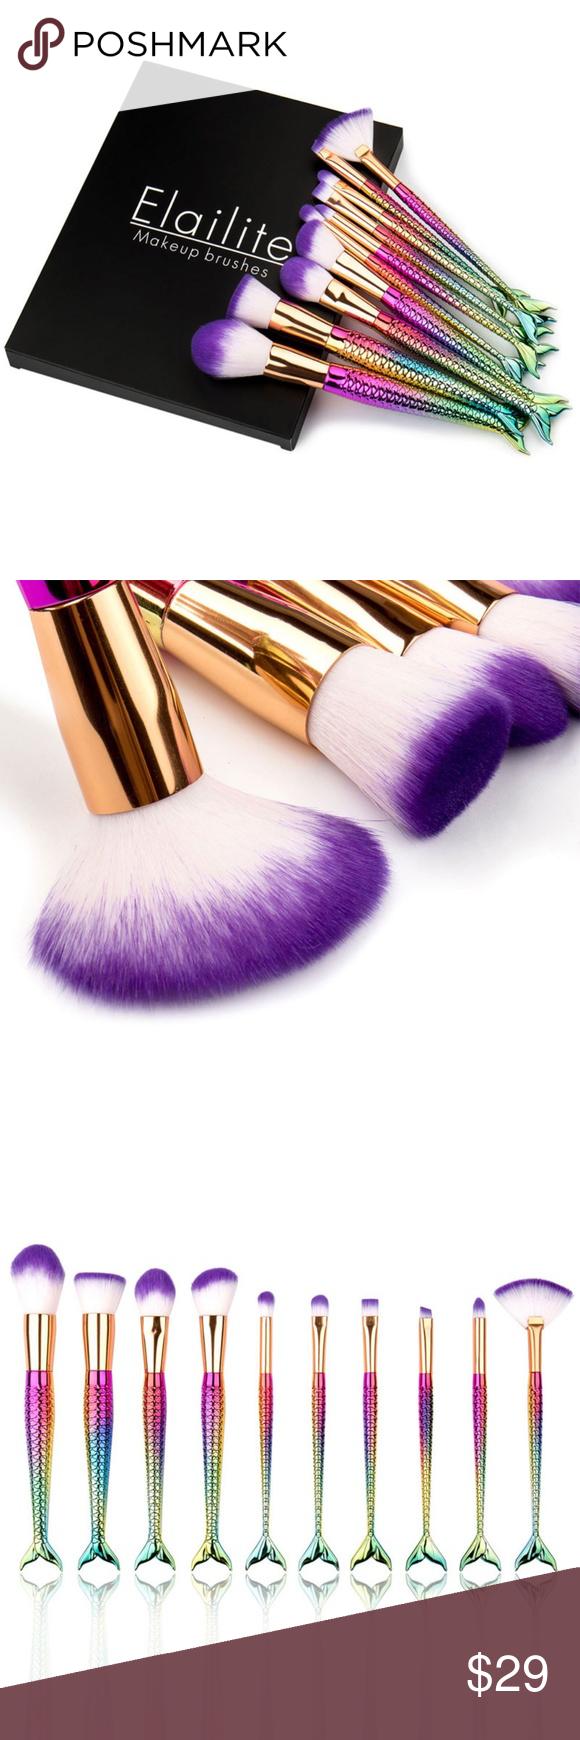 10Pcs Unicorn Mermaid Makeup Brush Set w/ Box Boutique